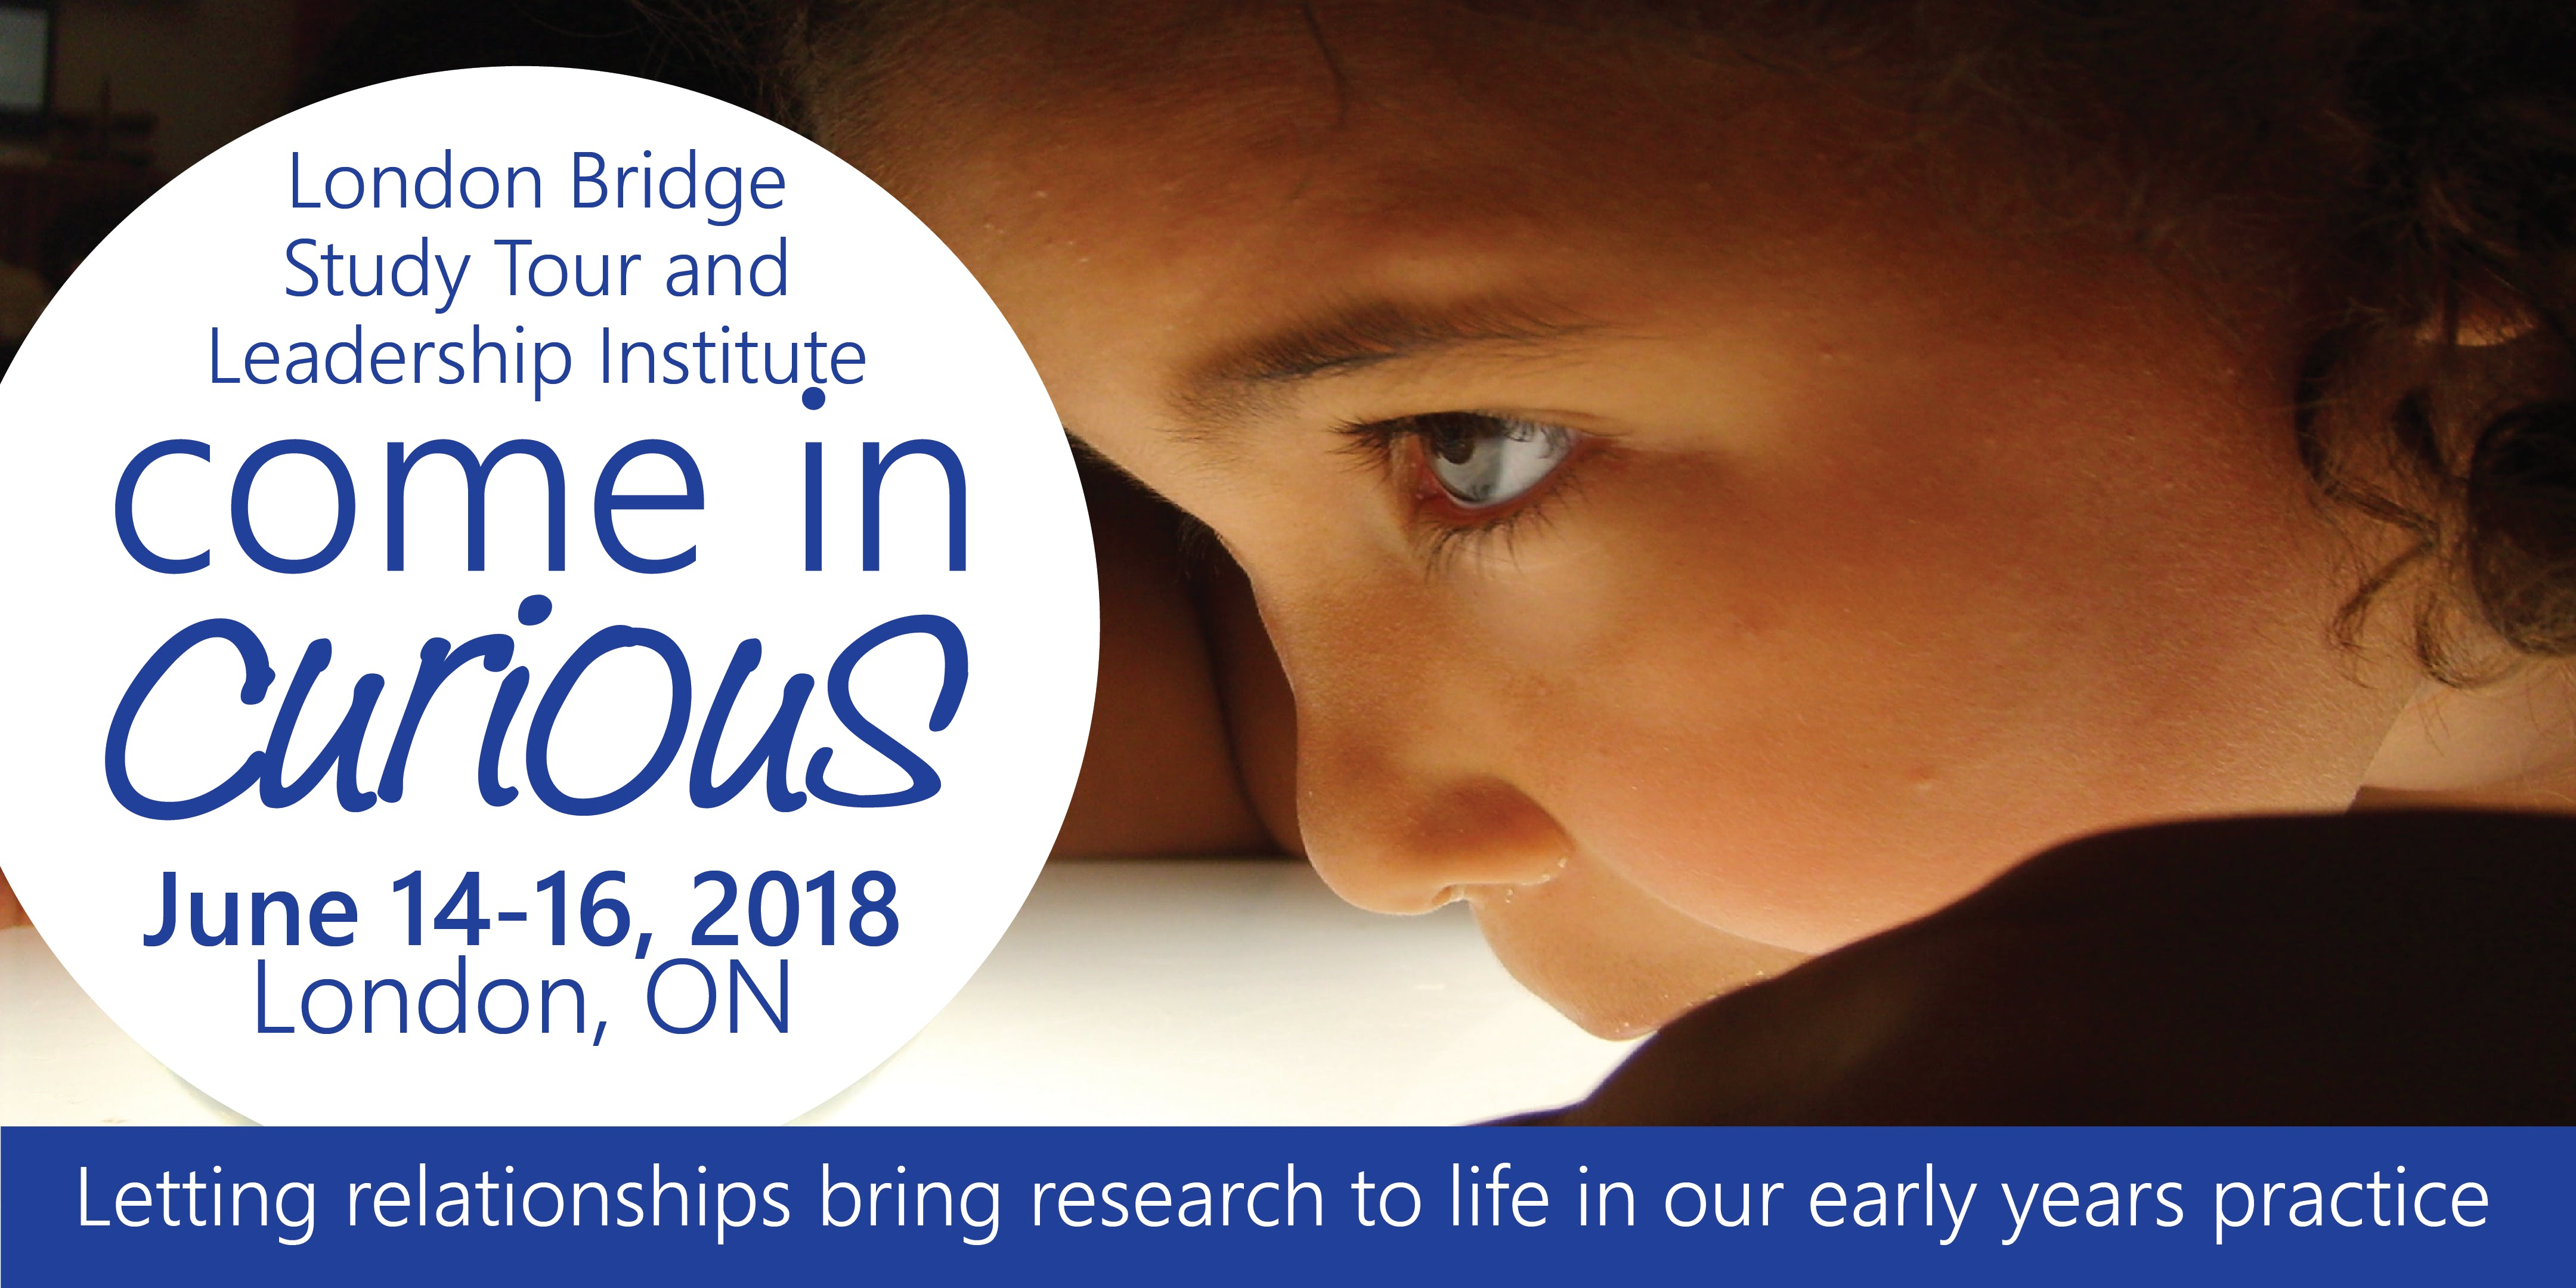 Come in Curious London Bridge Study Tour & Leadership Institute